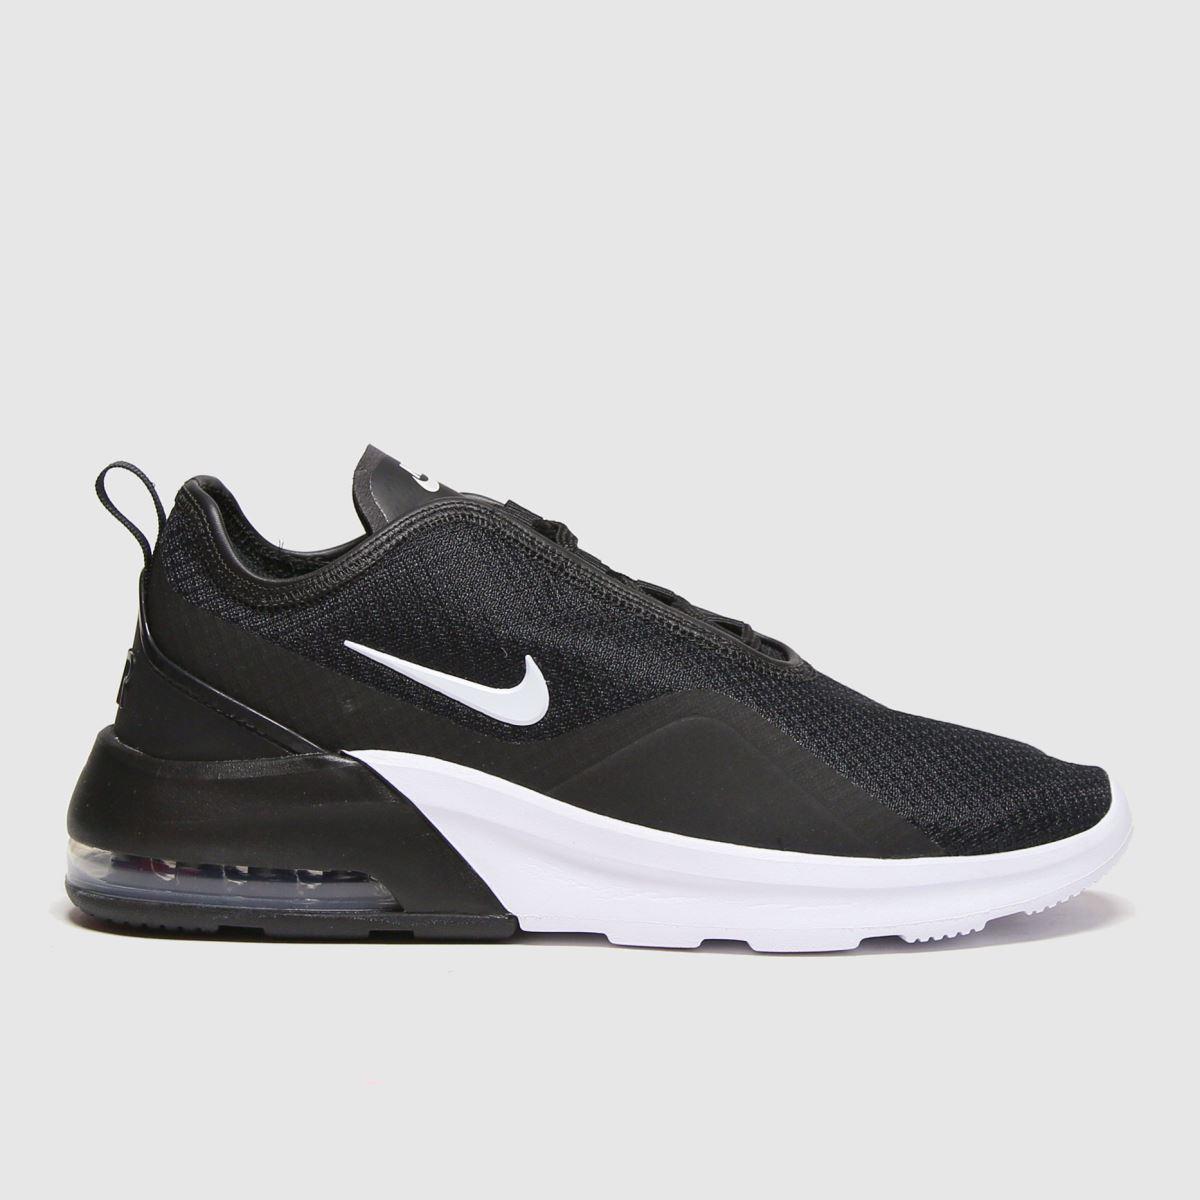 Nike Black & White Air Max Motion Trainers